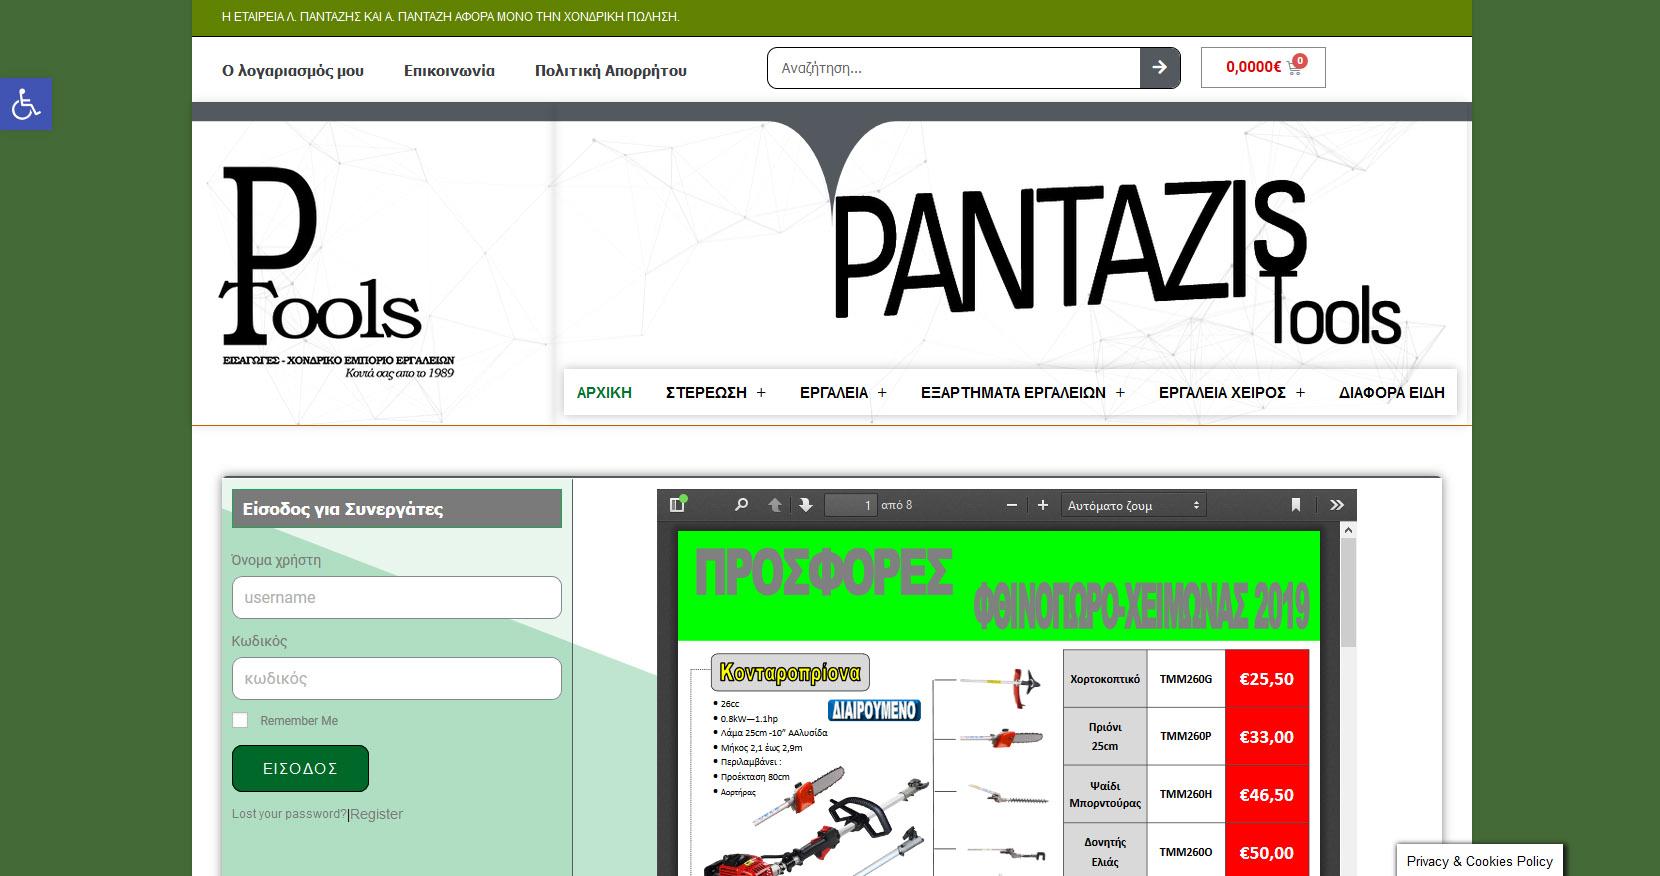 PantazisTools Frontpage photo